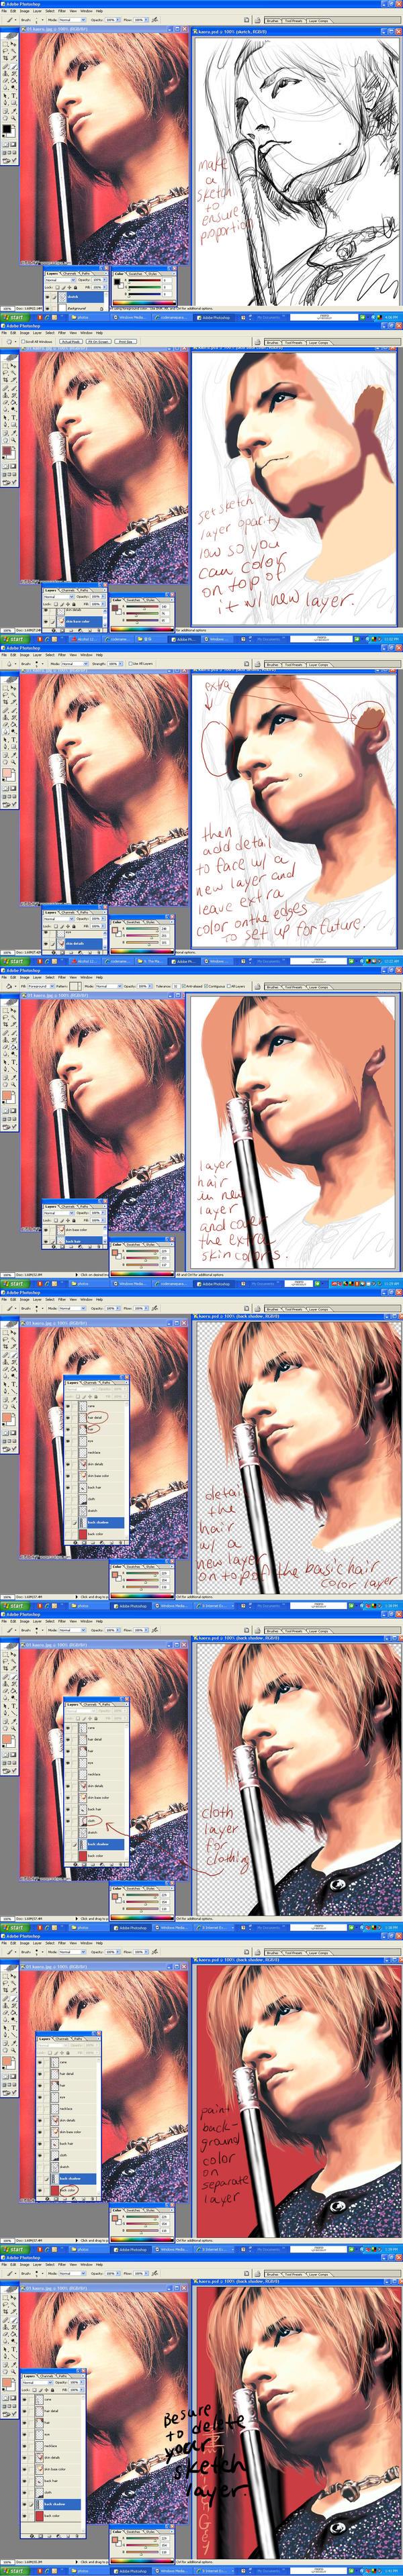 Photoshop realism tutorial